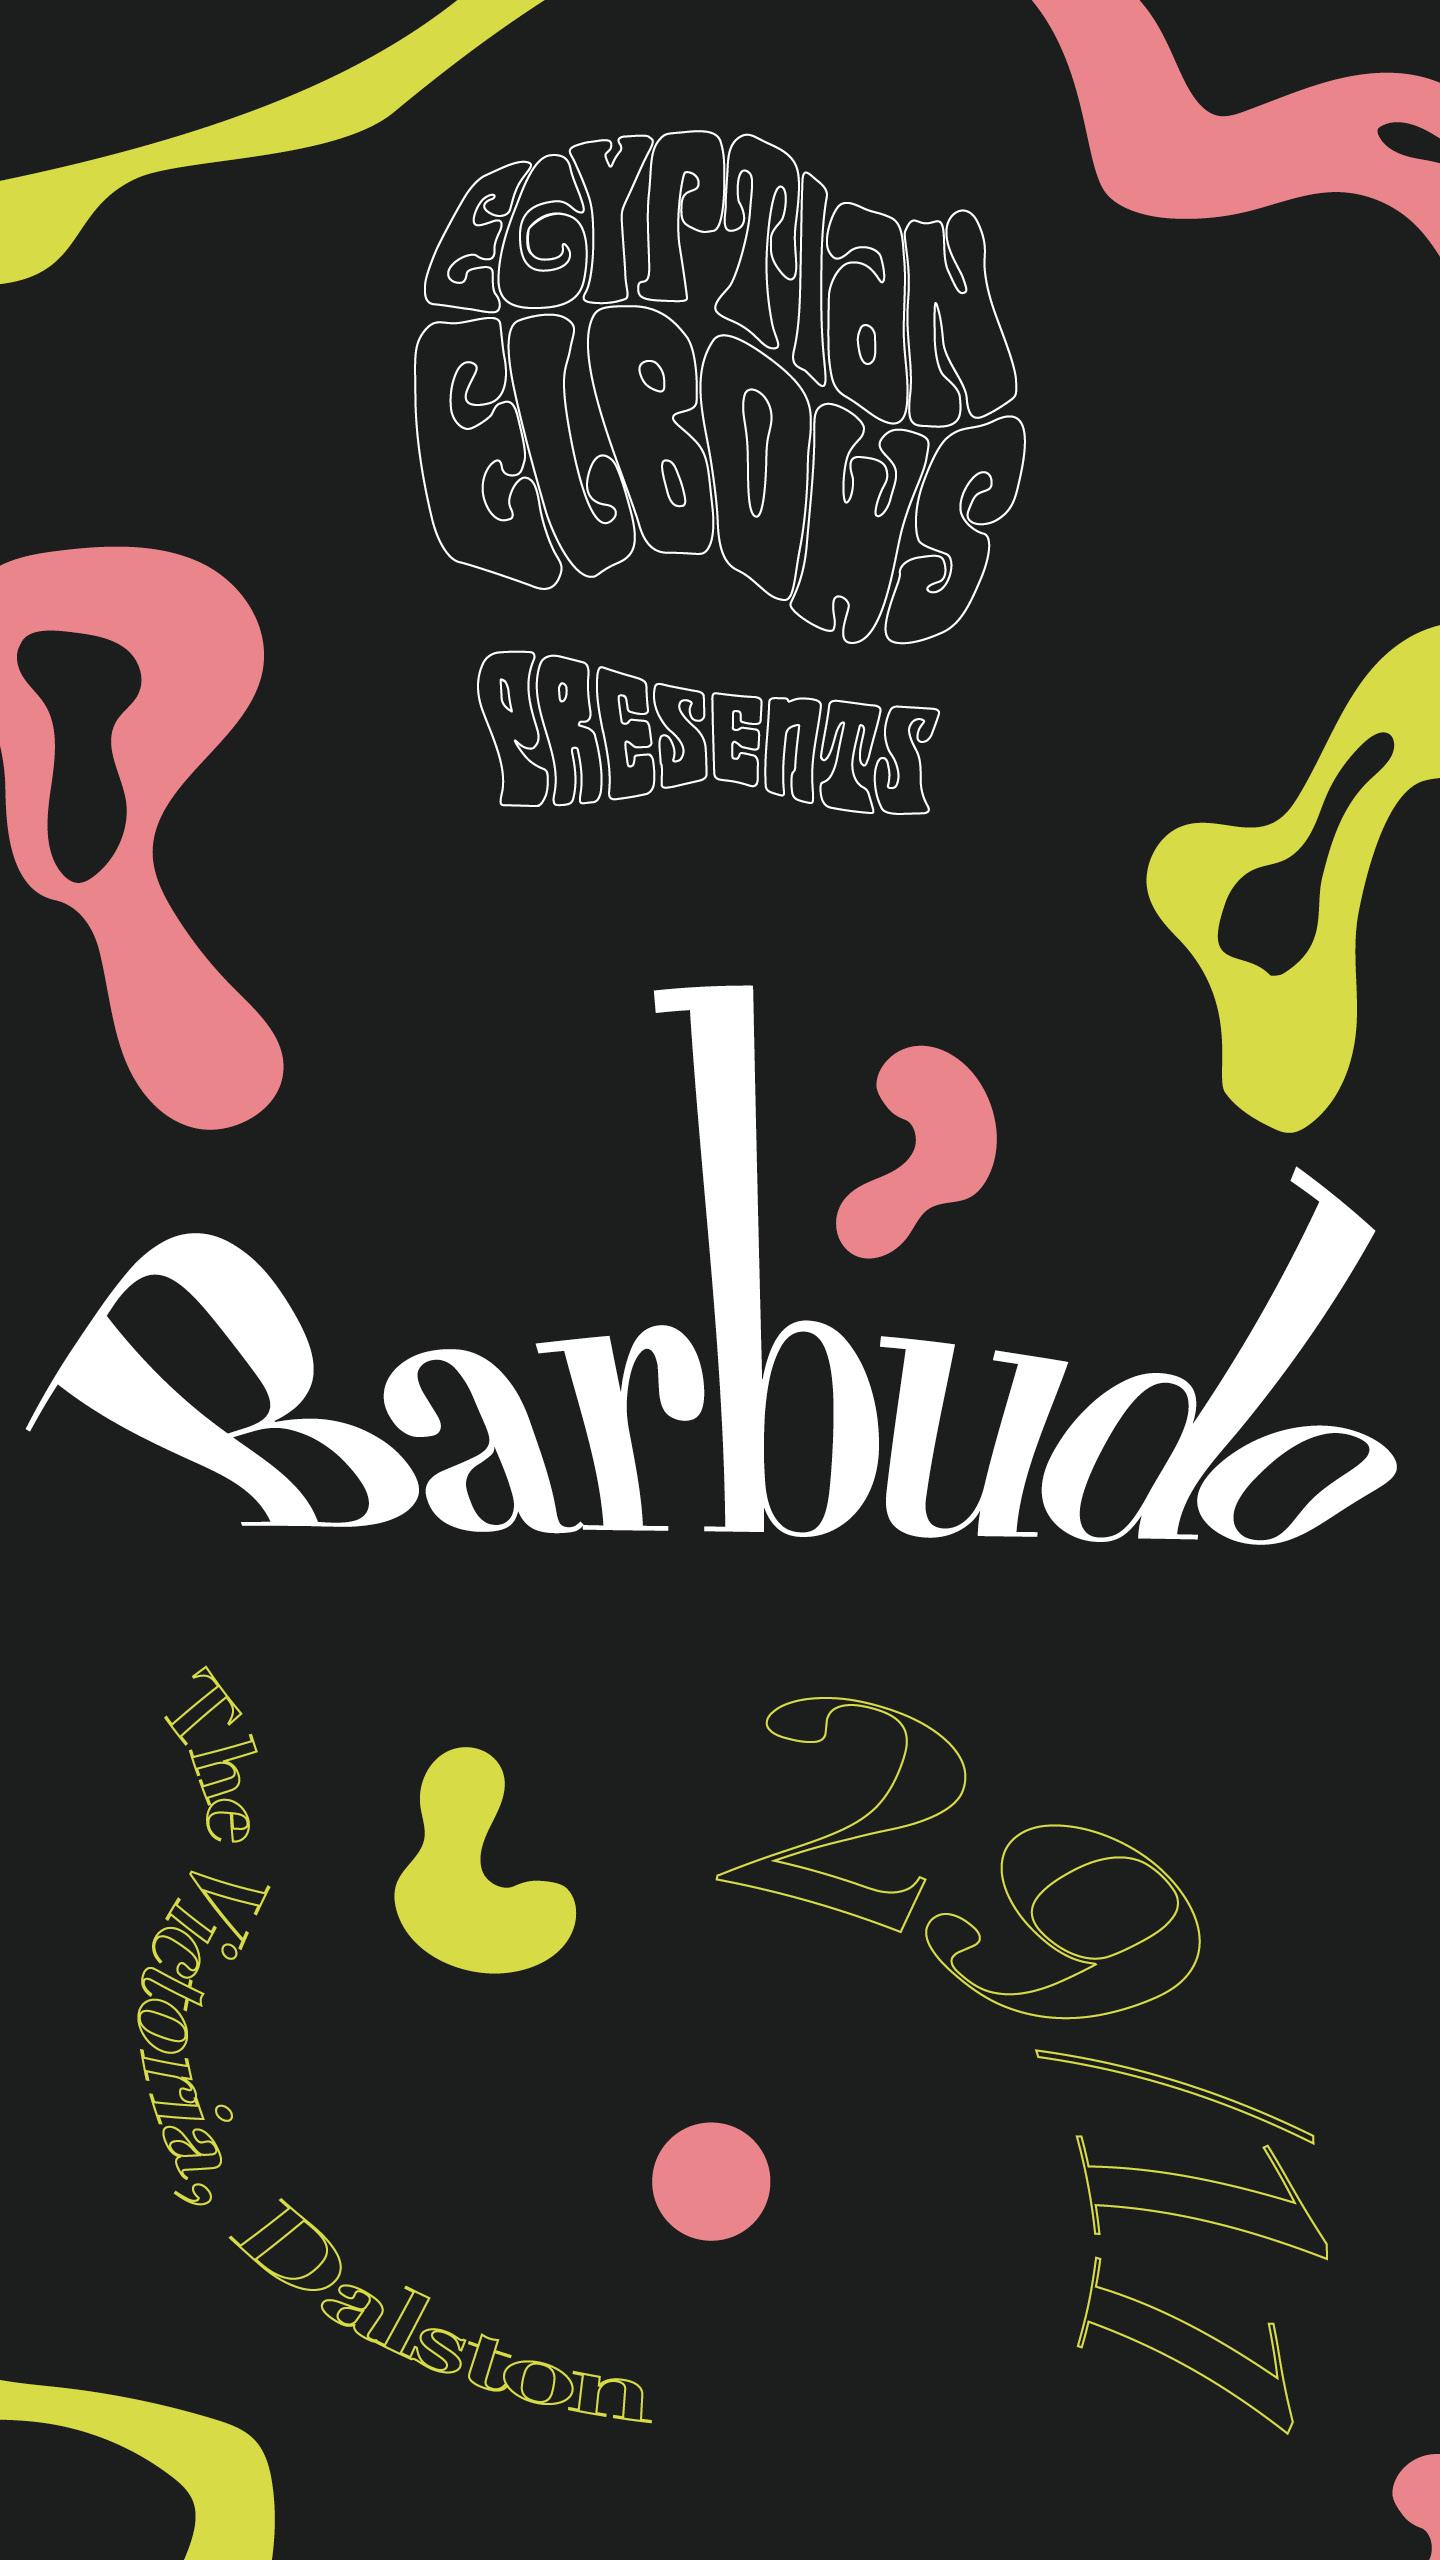 Barbudo_Insta Story.jpg